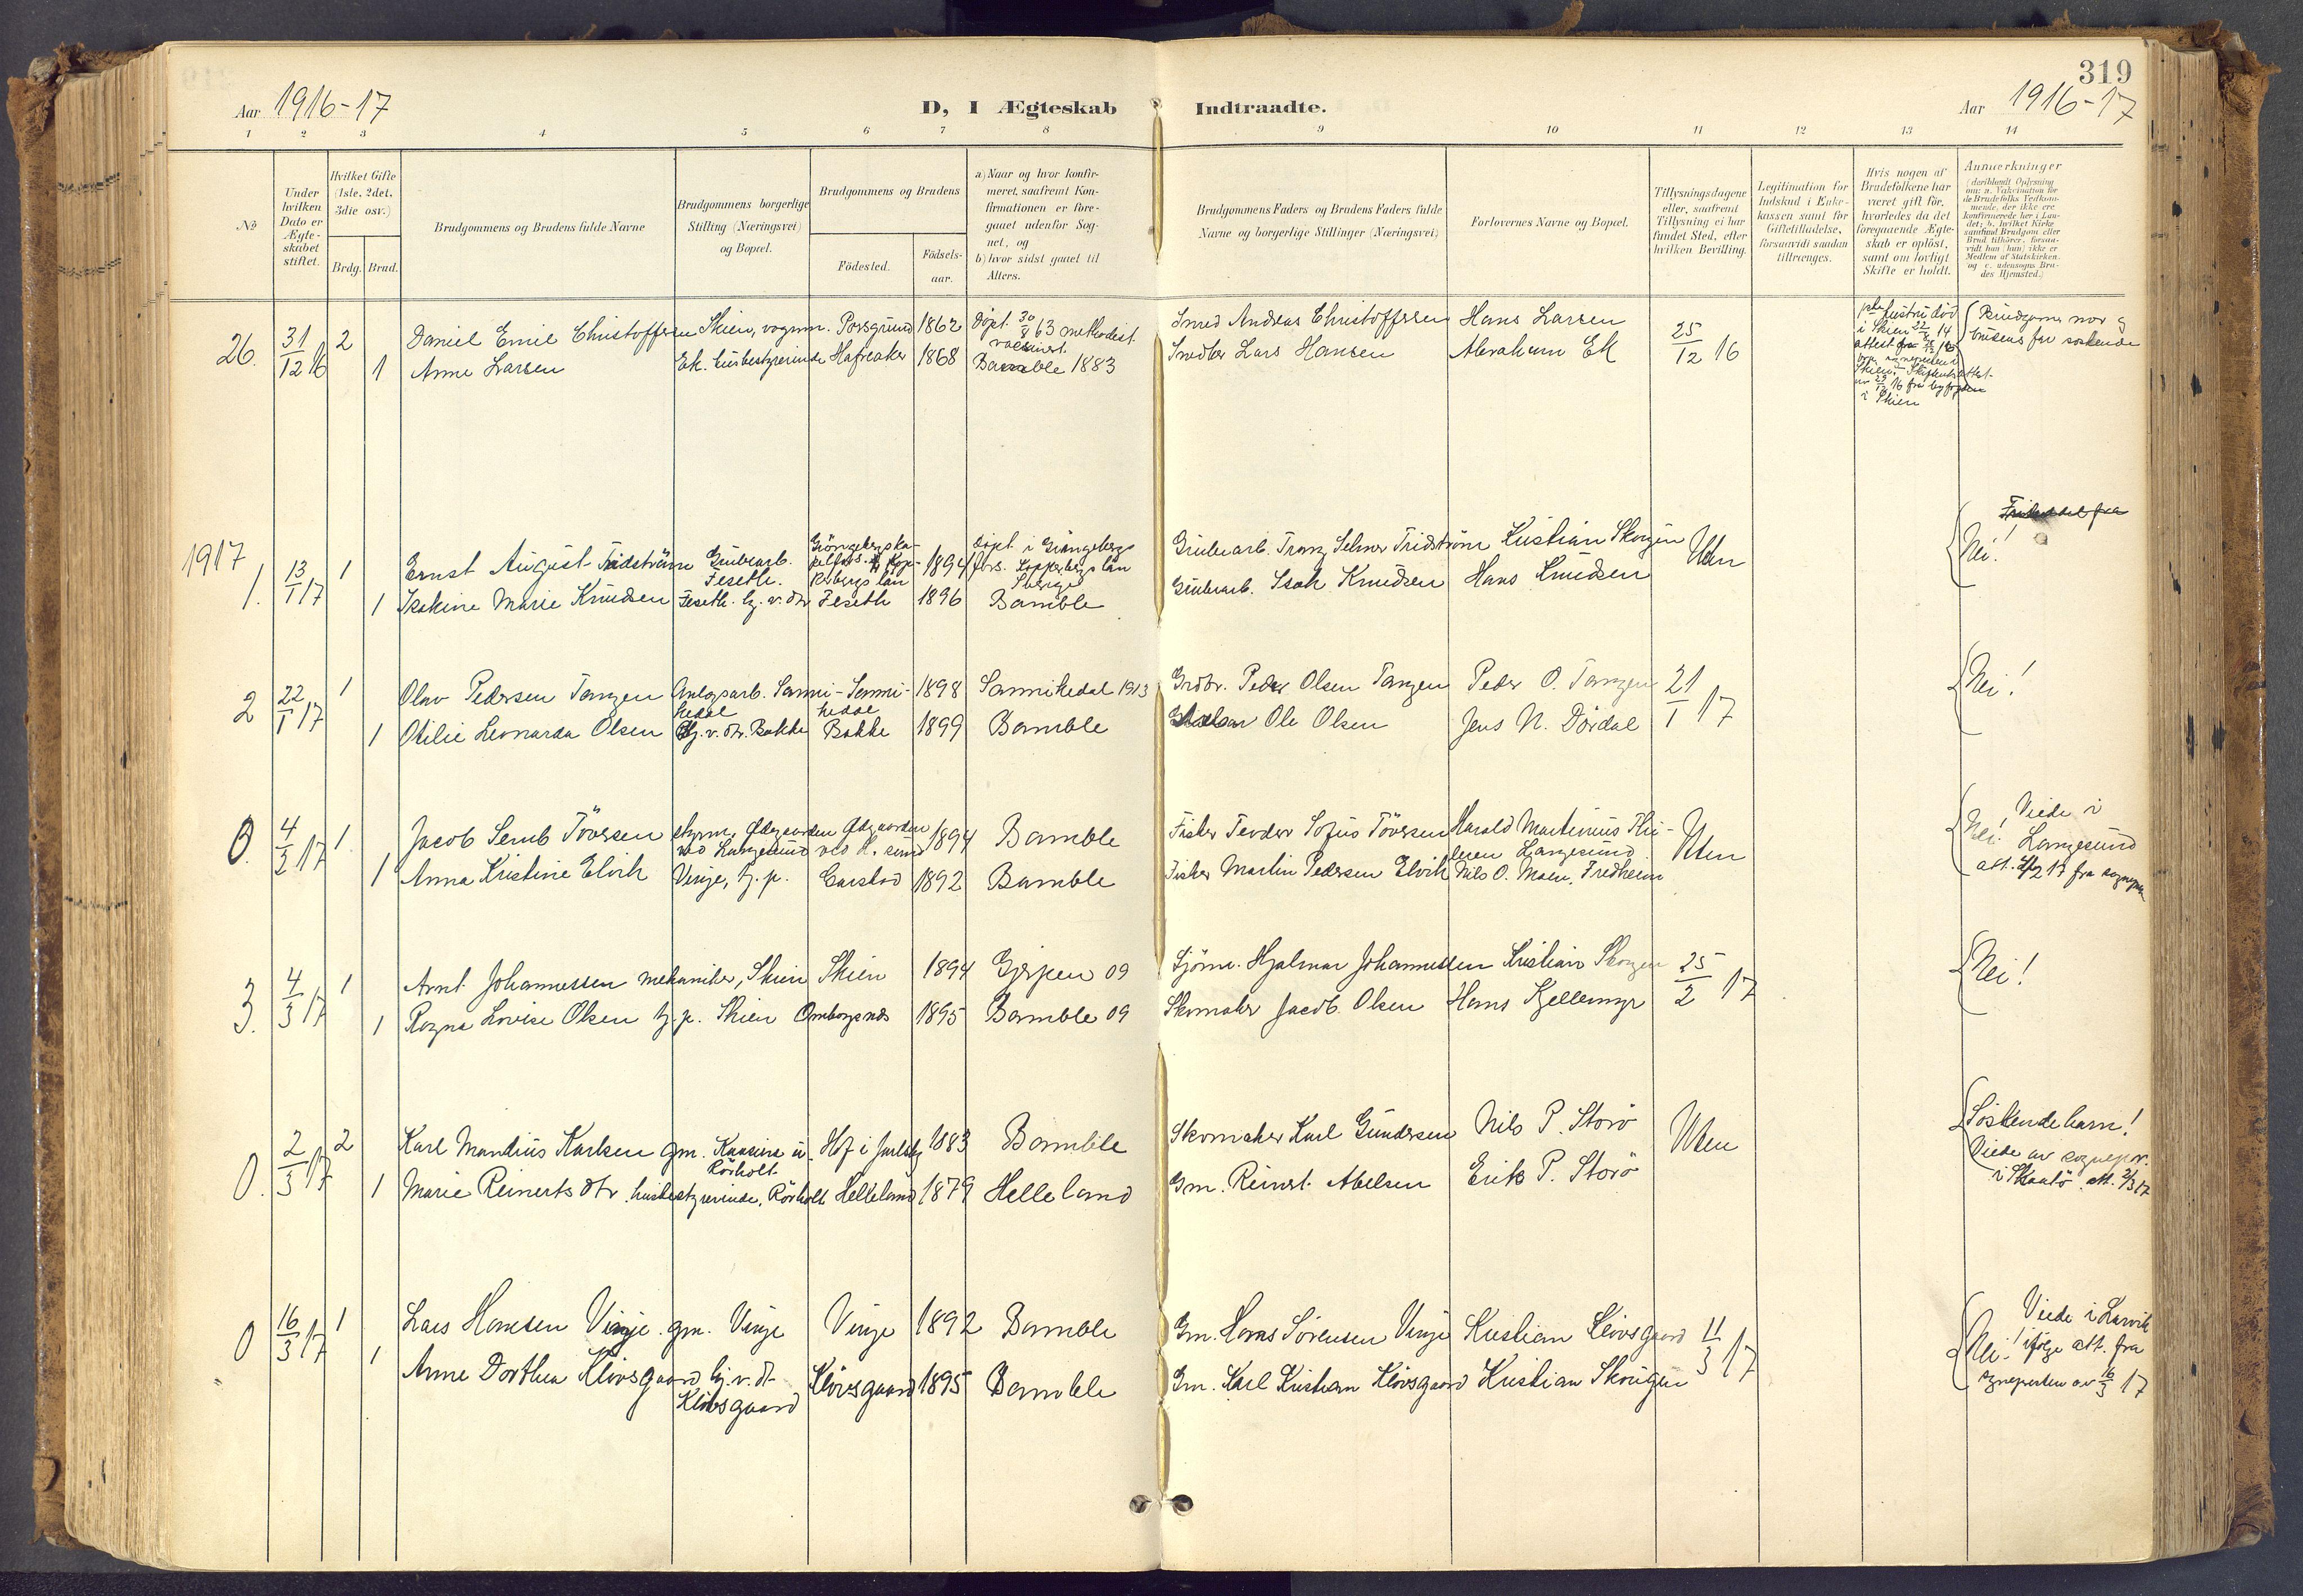 SAKO, Bamble kirkebøker, F/Fa/L0009: Ministerialbok nr. I 9, 1901-1917, s. 319